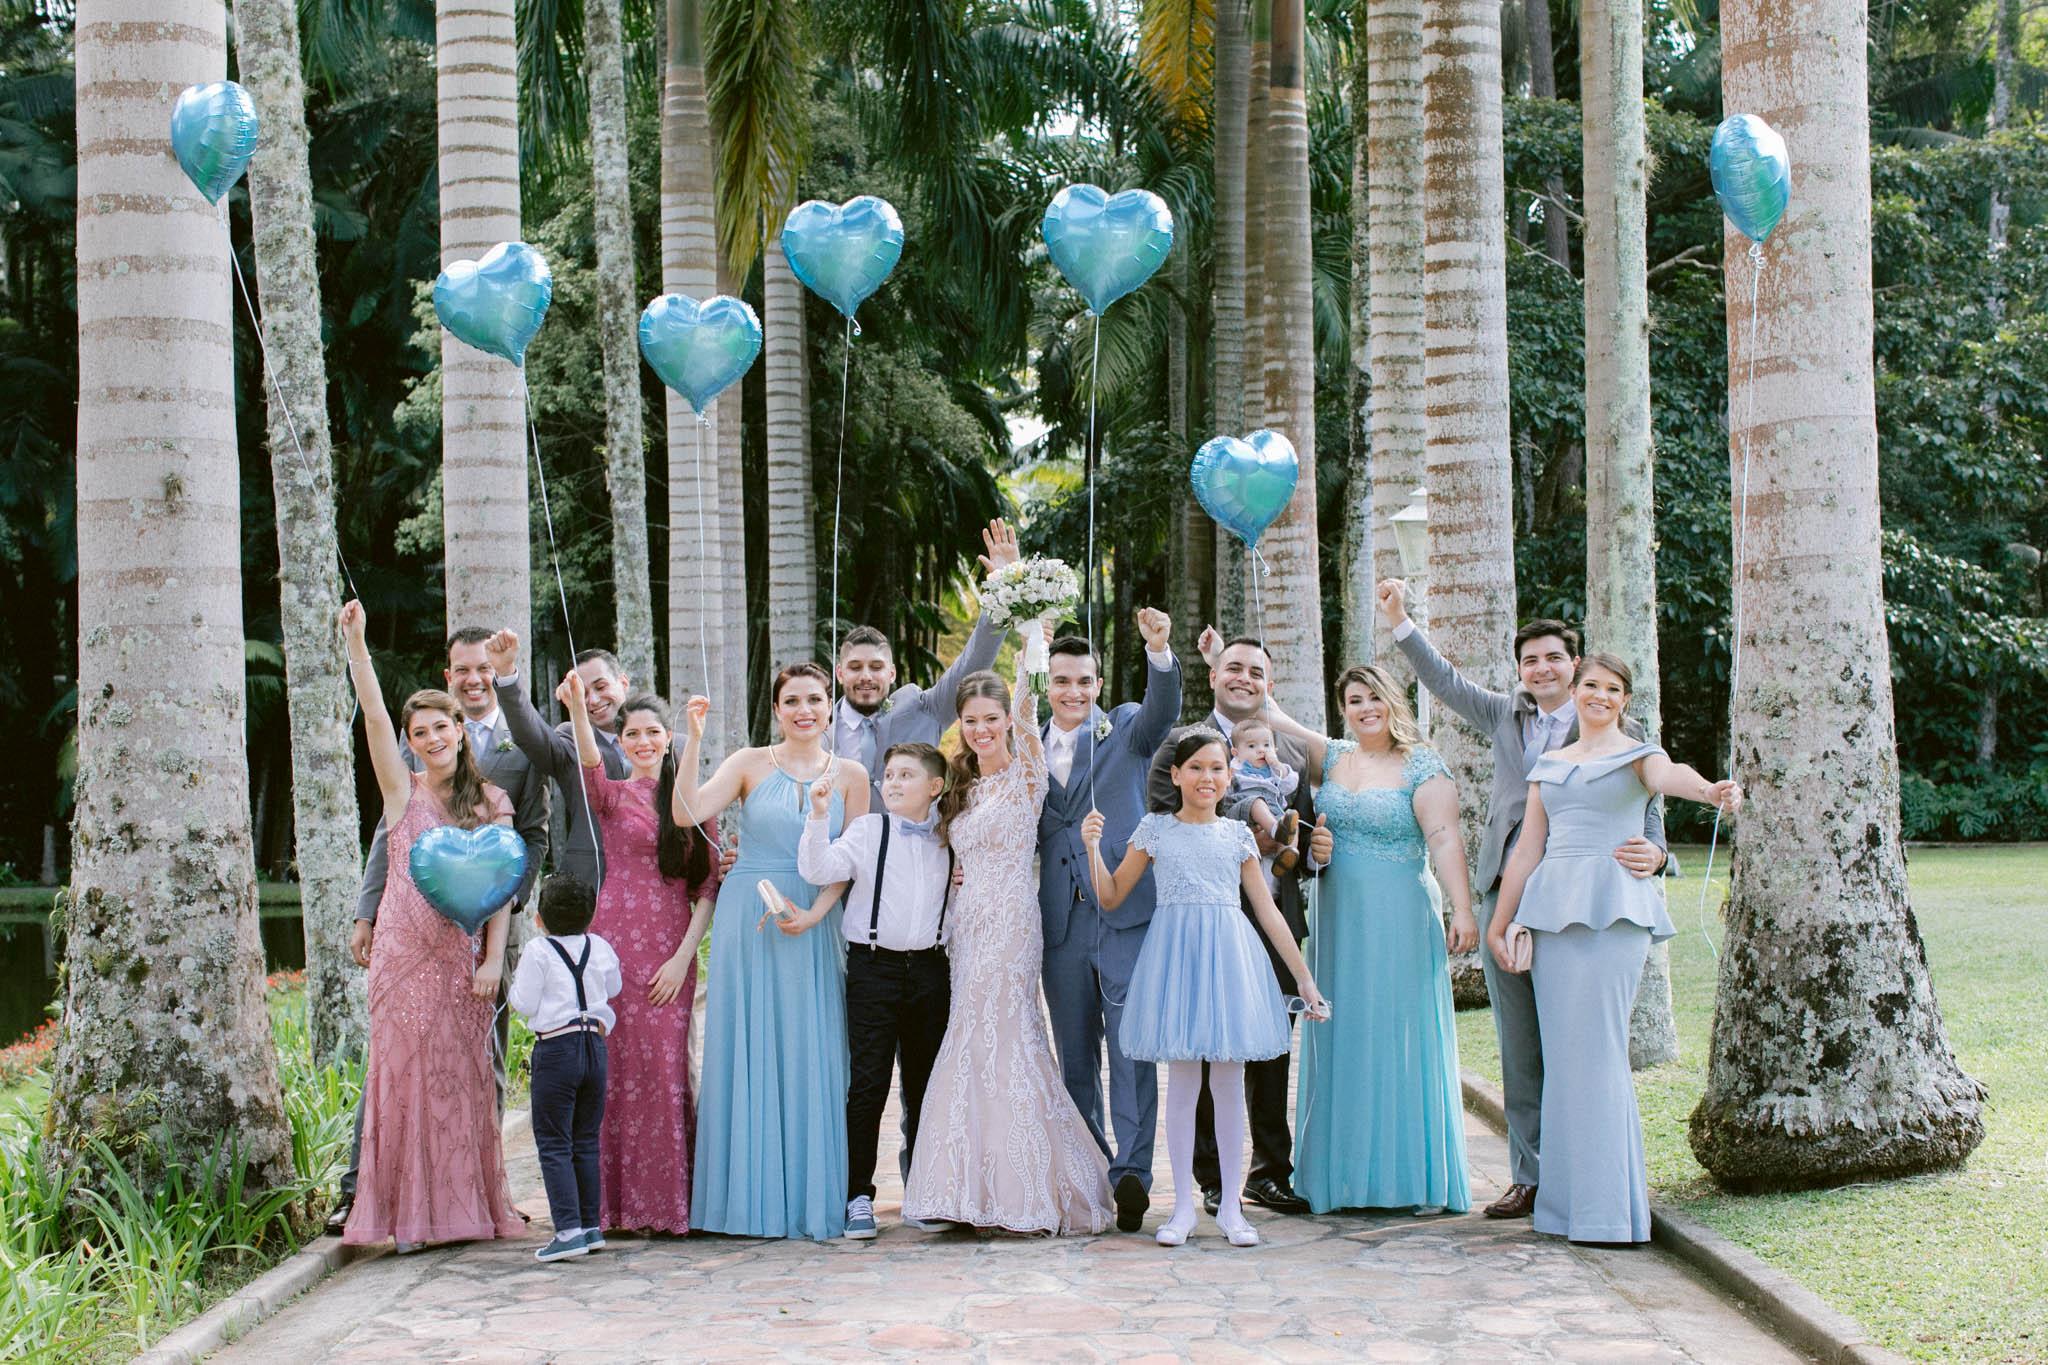 Isabeli e Vinicius | Casamento encantado na Fazenda 7 Lagoas, por Juliana Valim